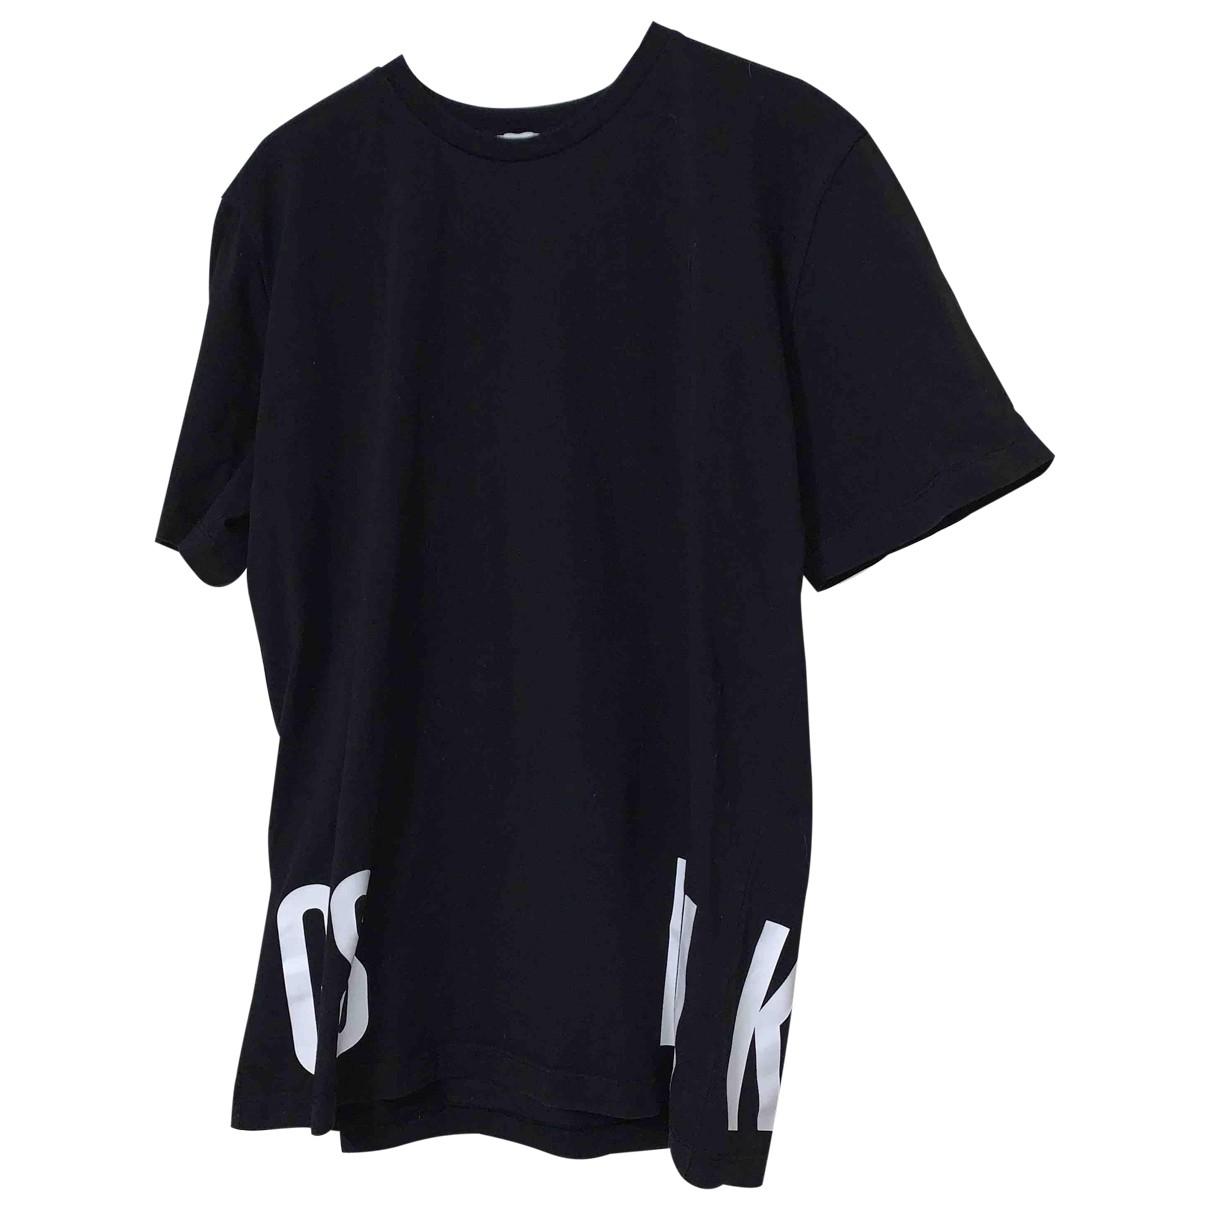 Dirk Bikkembergs \N Black Cotton T-shirts for Men M International